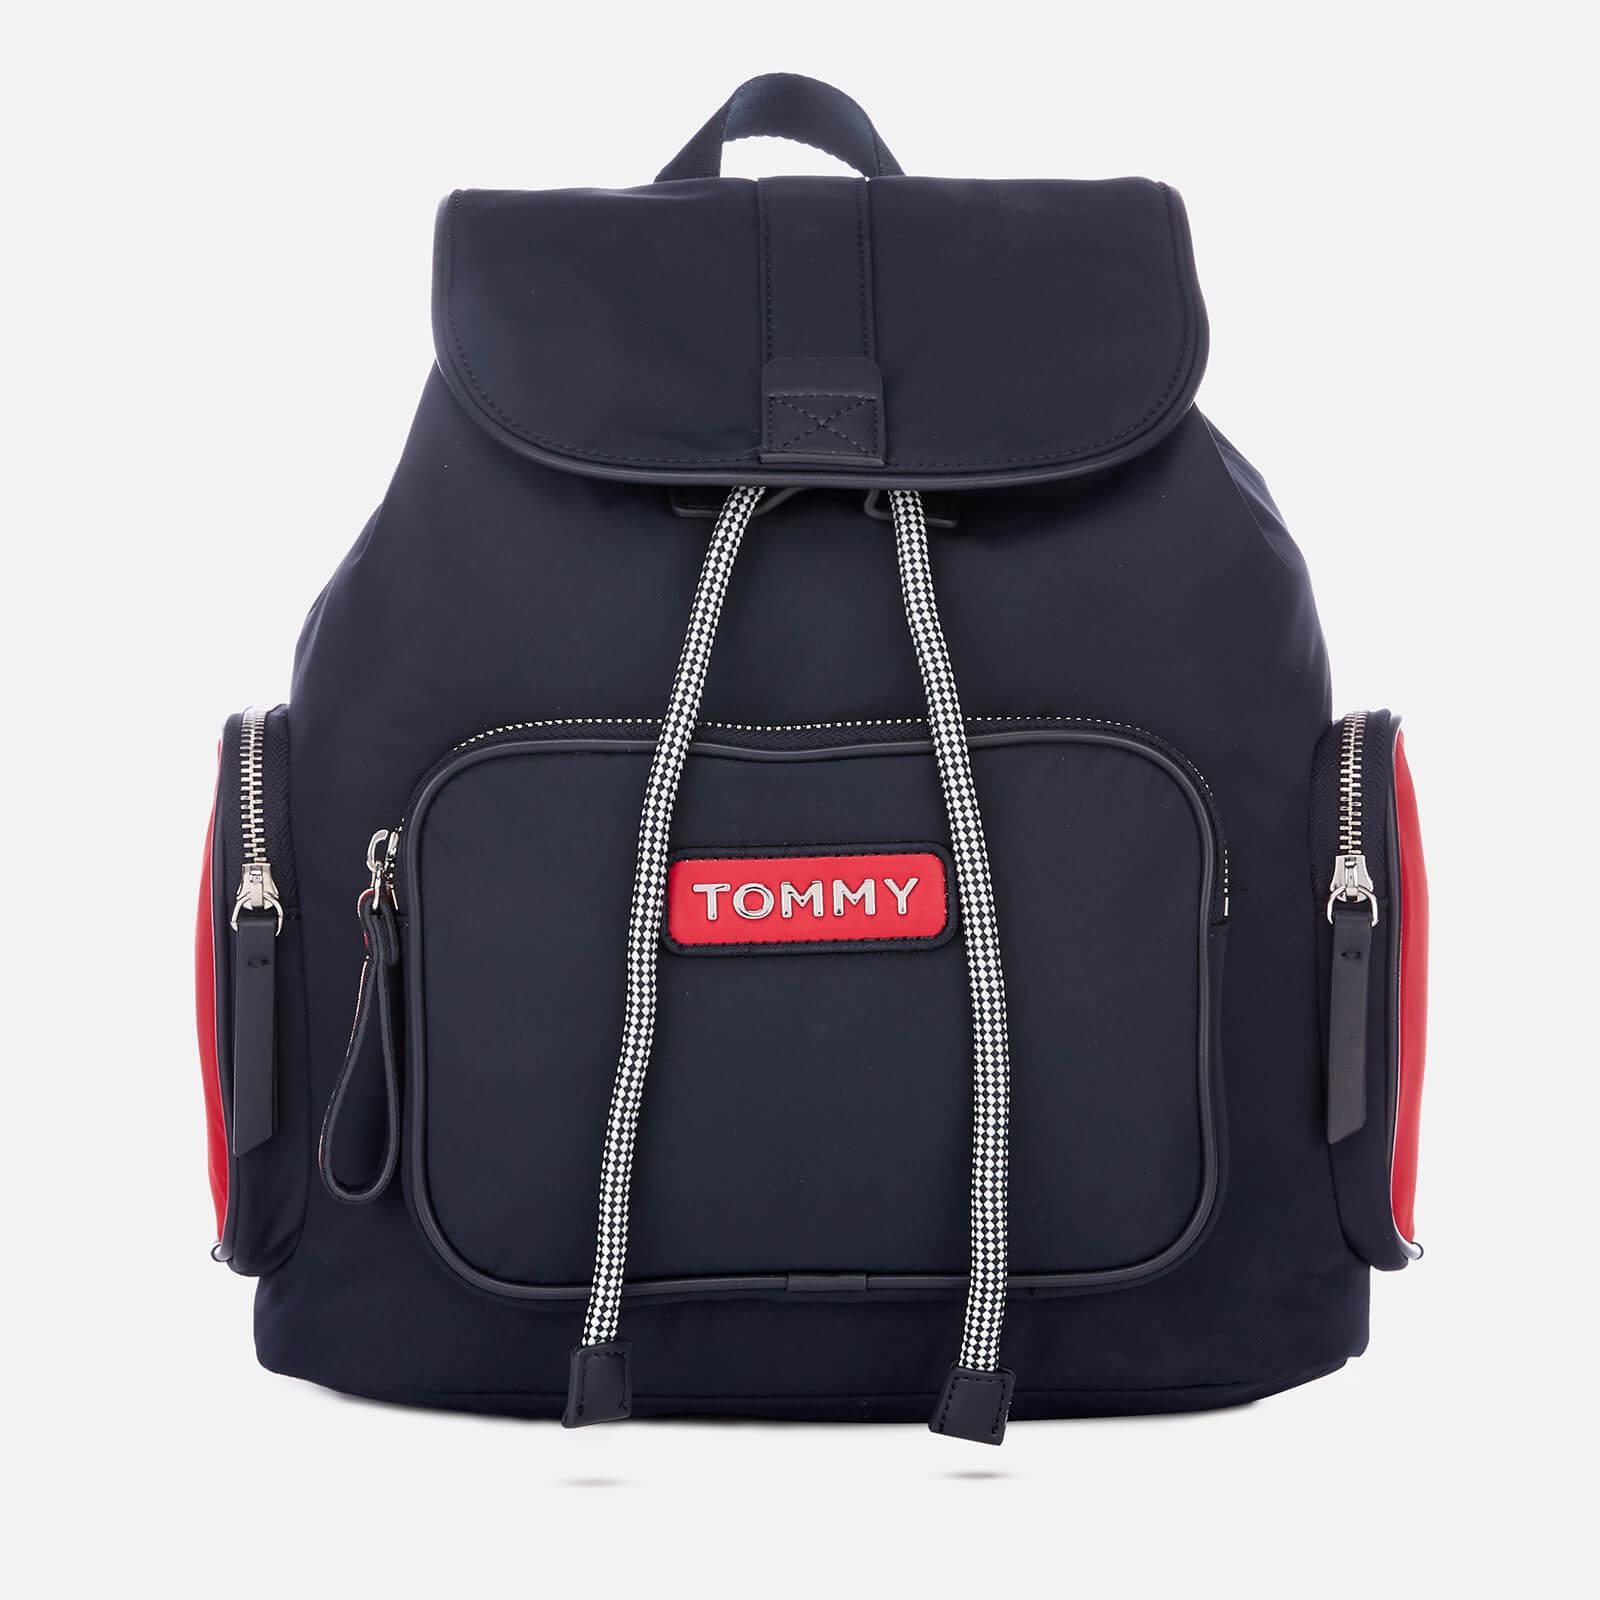 840f50913 Tommy Hilfiger Women's Varsity Nylon Backpack - Corporate Womens  Accessories | TheHut.com